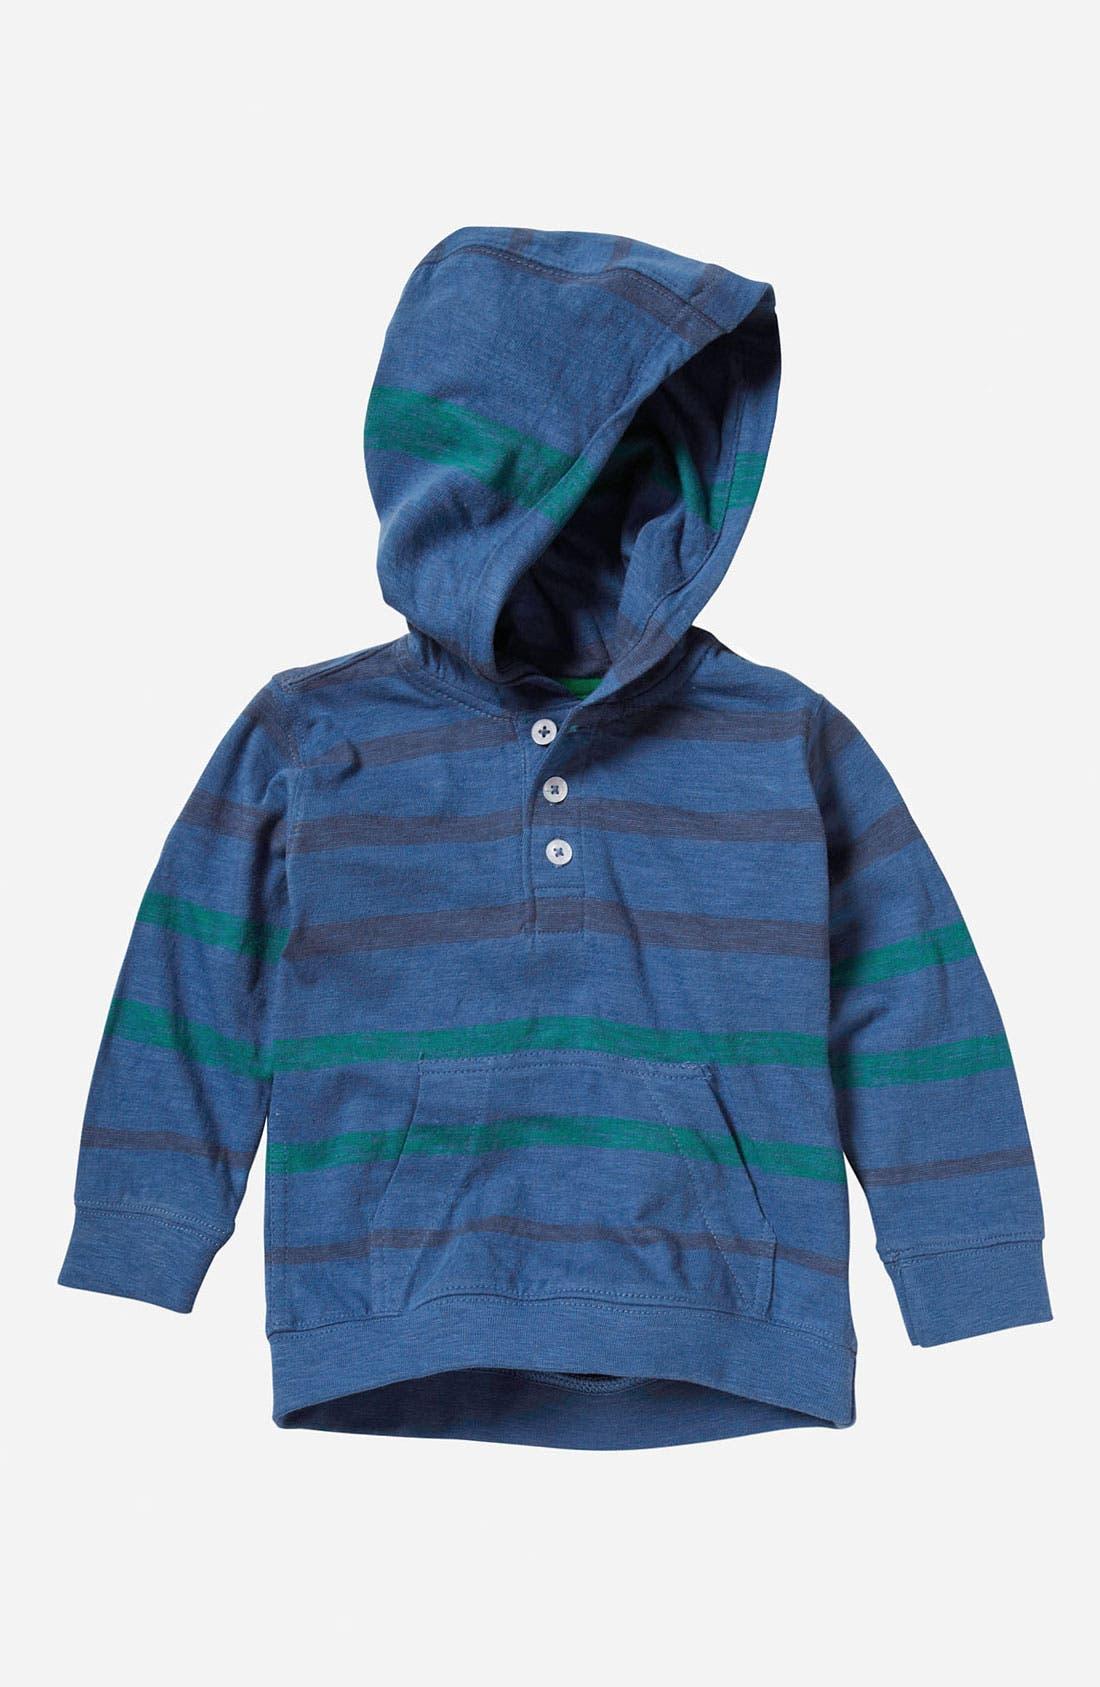 Main Image - Quiksilver 'Merz' Hooded Henley Top (Infant)